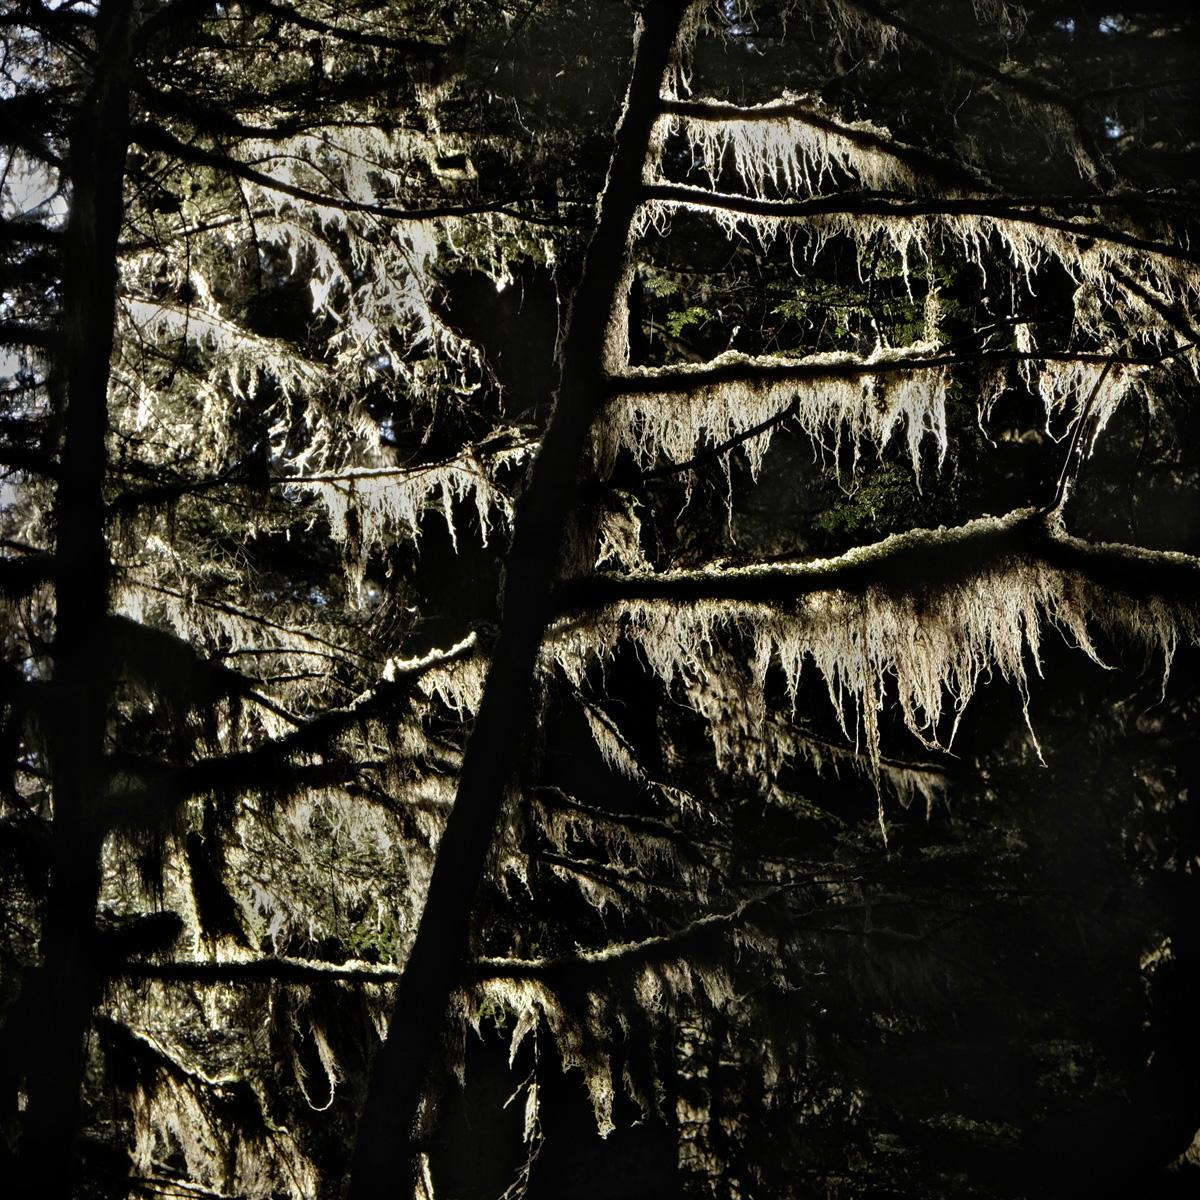 Sol Duc Waterfall Trail, Olympic National Park, Washington, 2014.